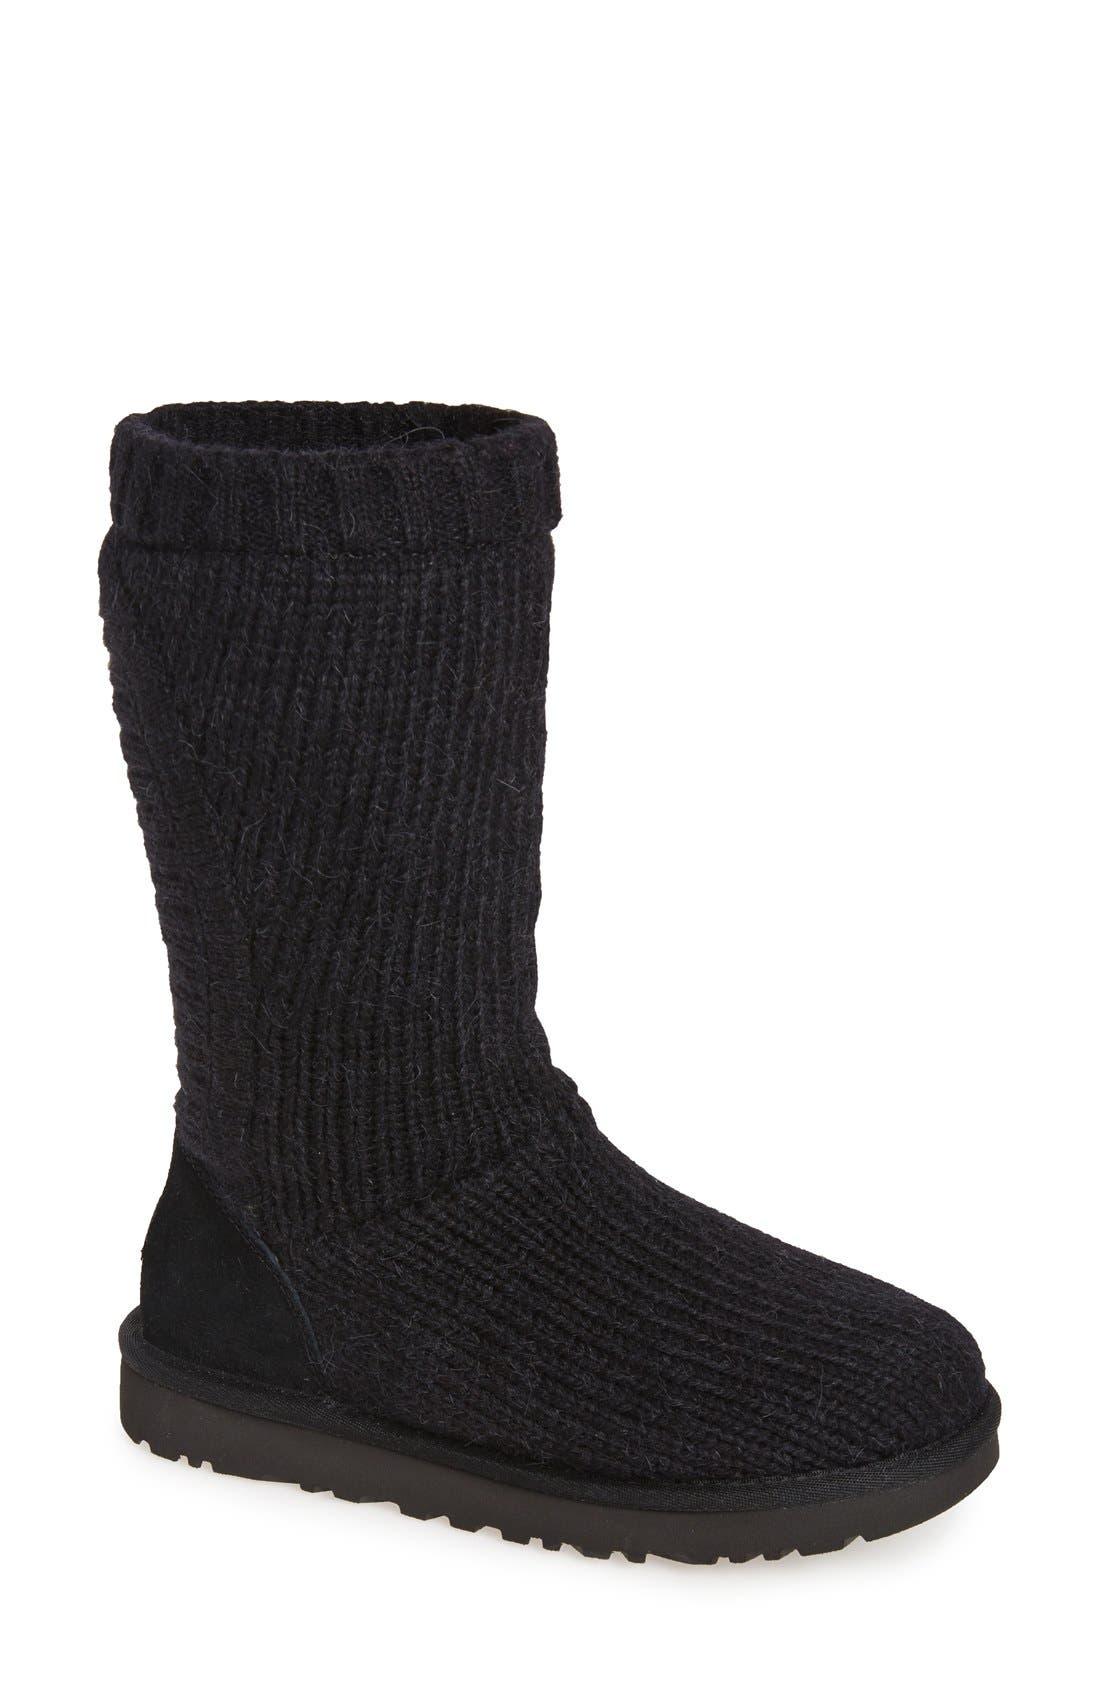 'Capra' Ribbed Knit Genuine Shearling Lined Boot,                             Main thumbnail 1, color,                             001